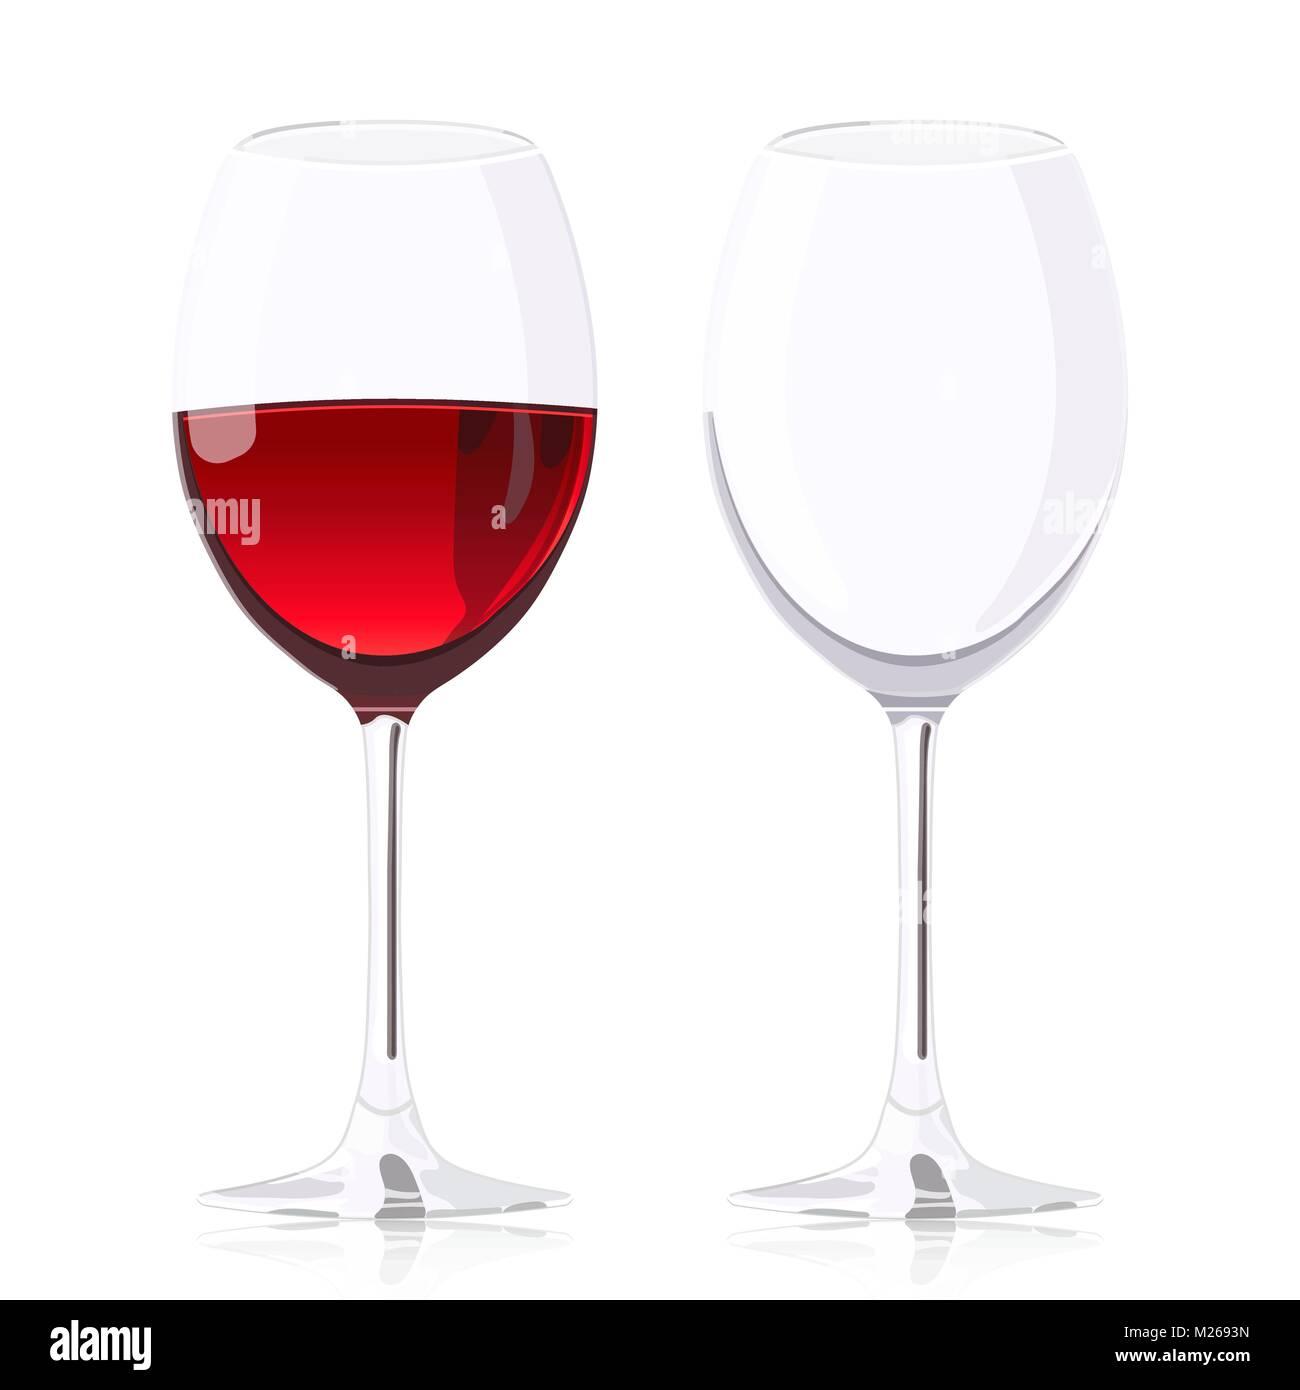 cc054f97a7b Set glass goblets